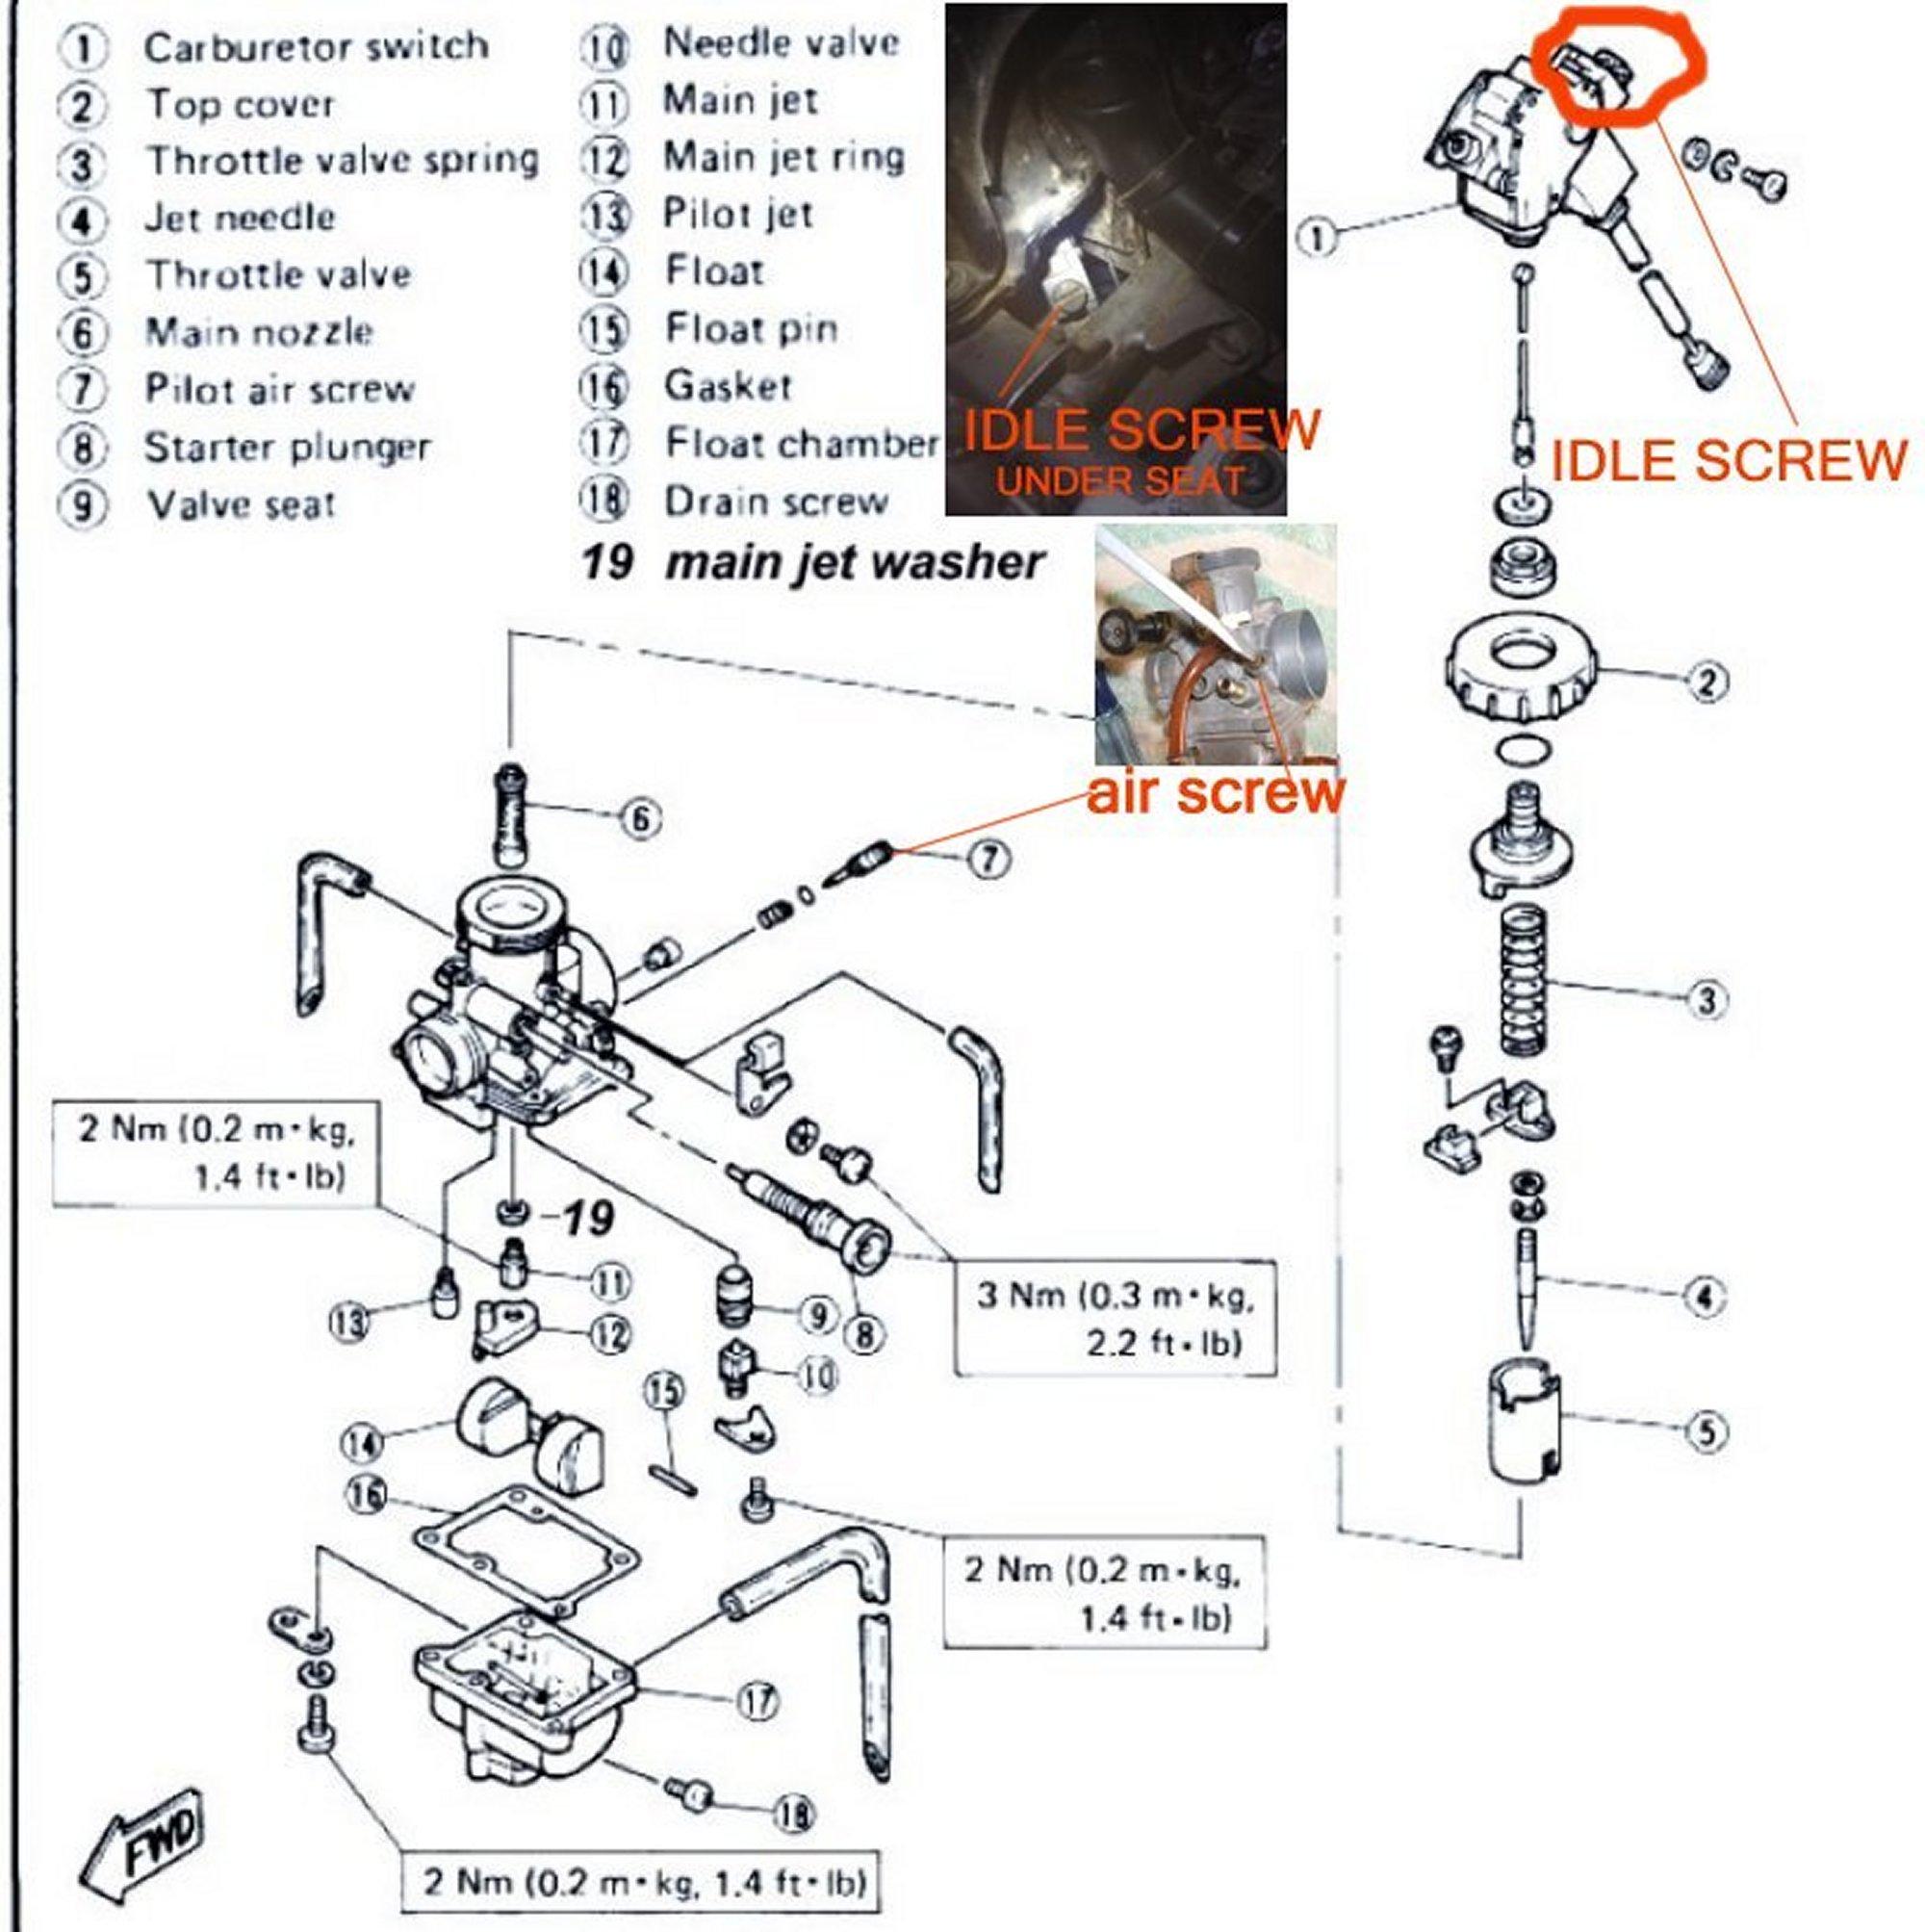 hight resolution of new blaster need jetting help blasterforum comcarb plus idle 1 1 1 big 1 jpg